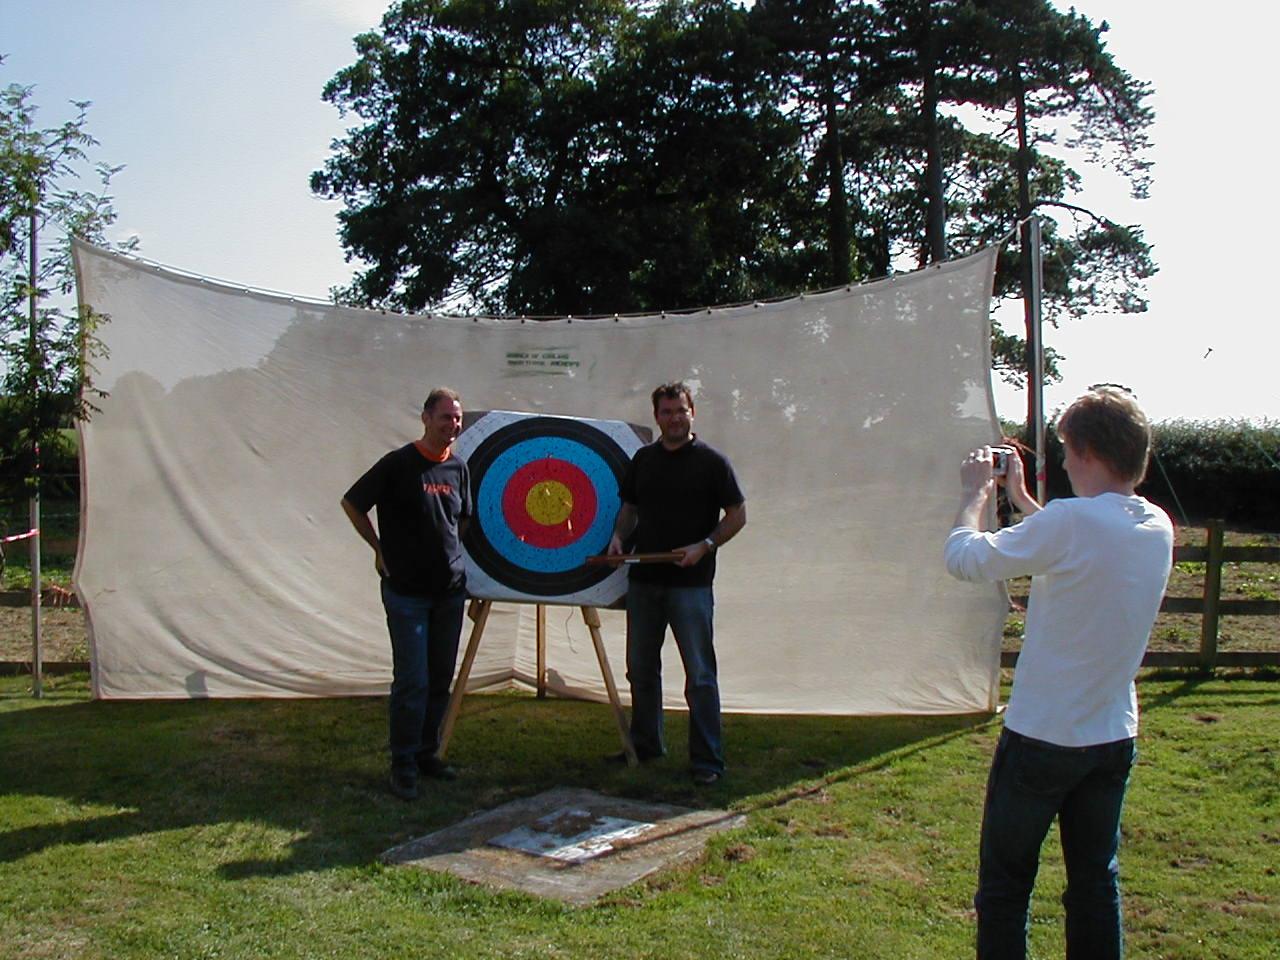 Ancient skills - Archery